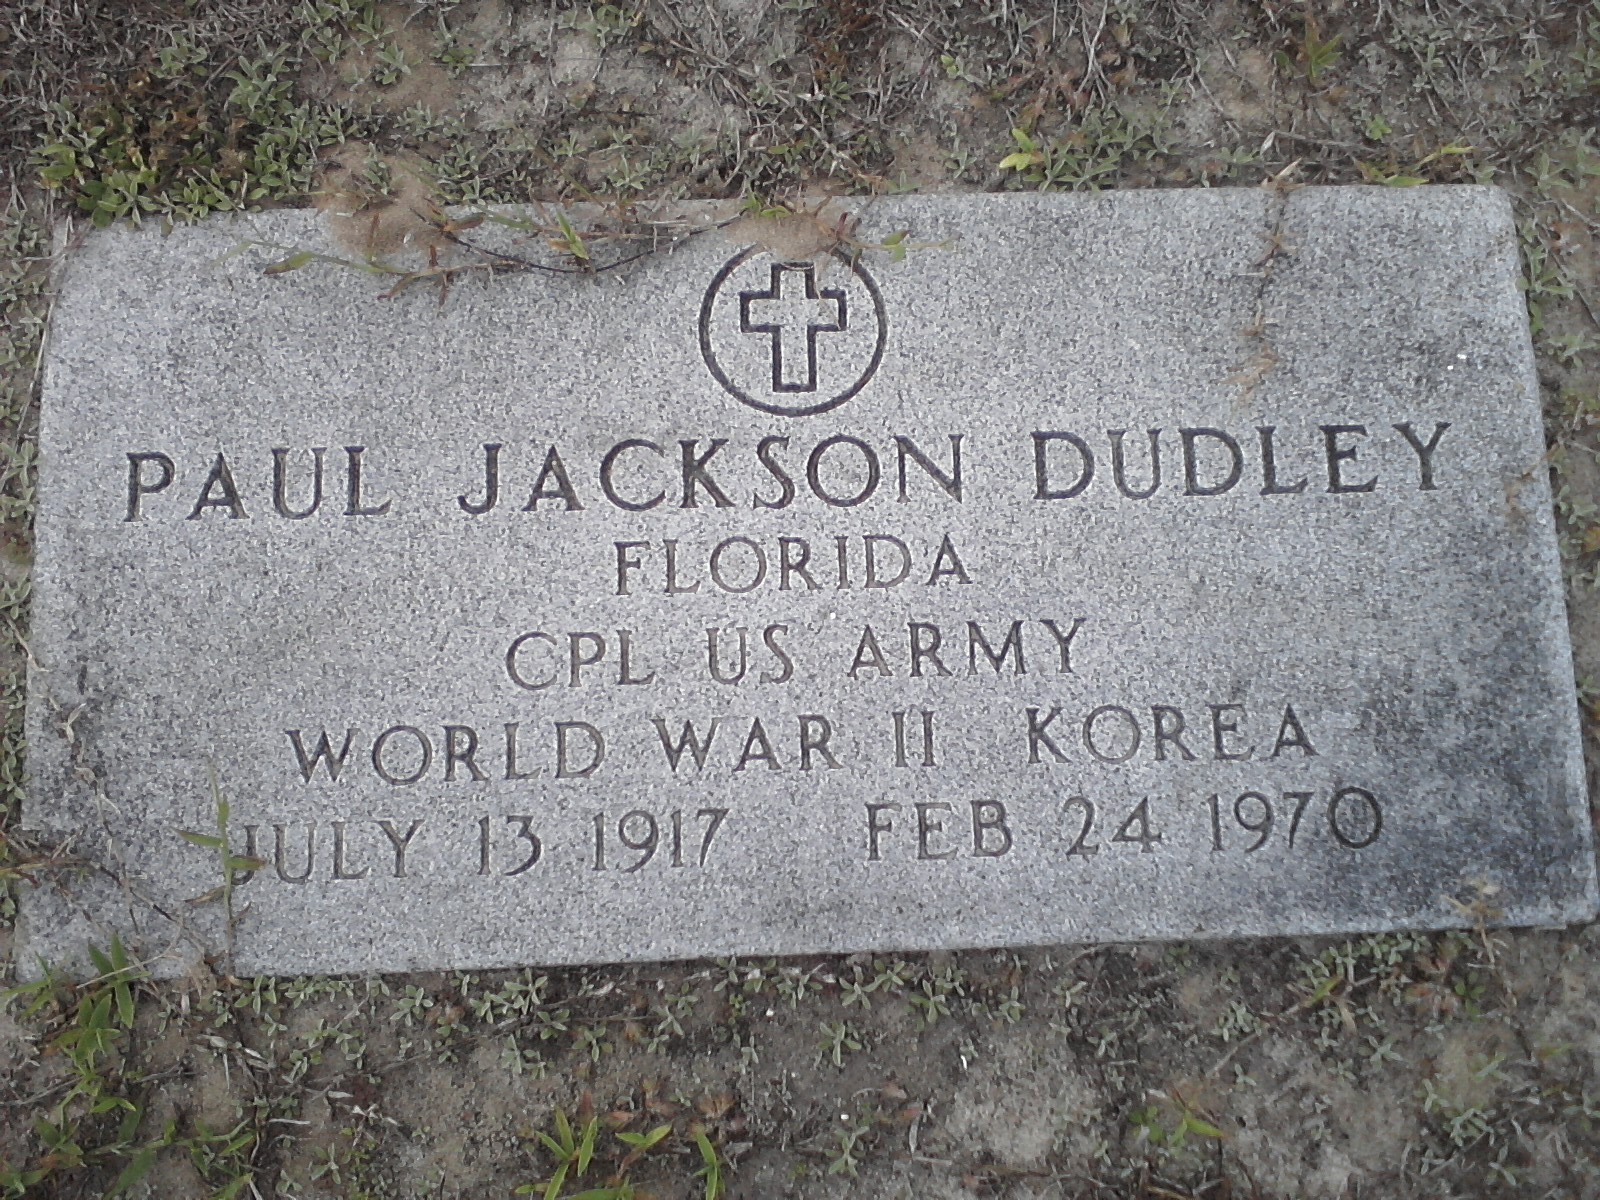 Paul Jackson Dudley, Sr